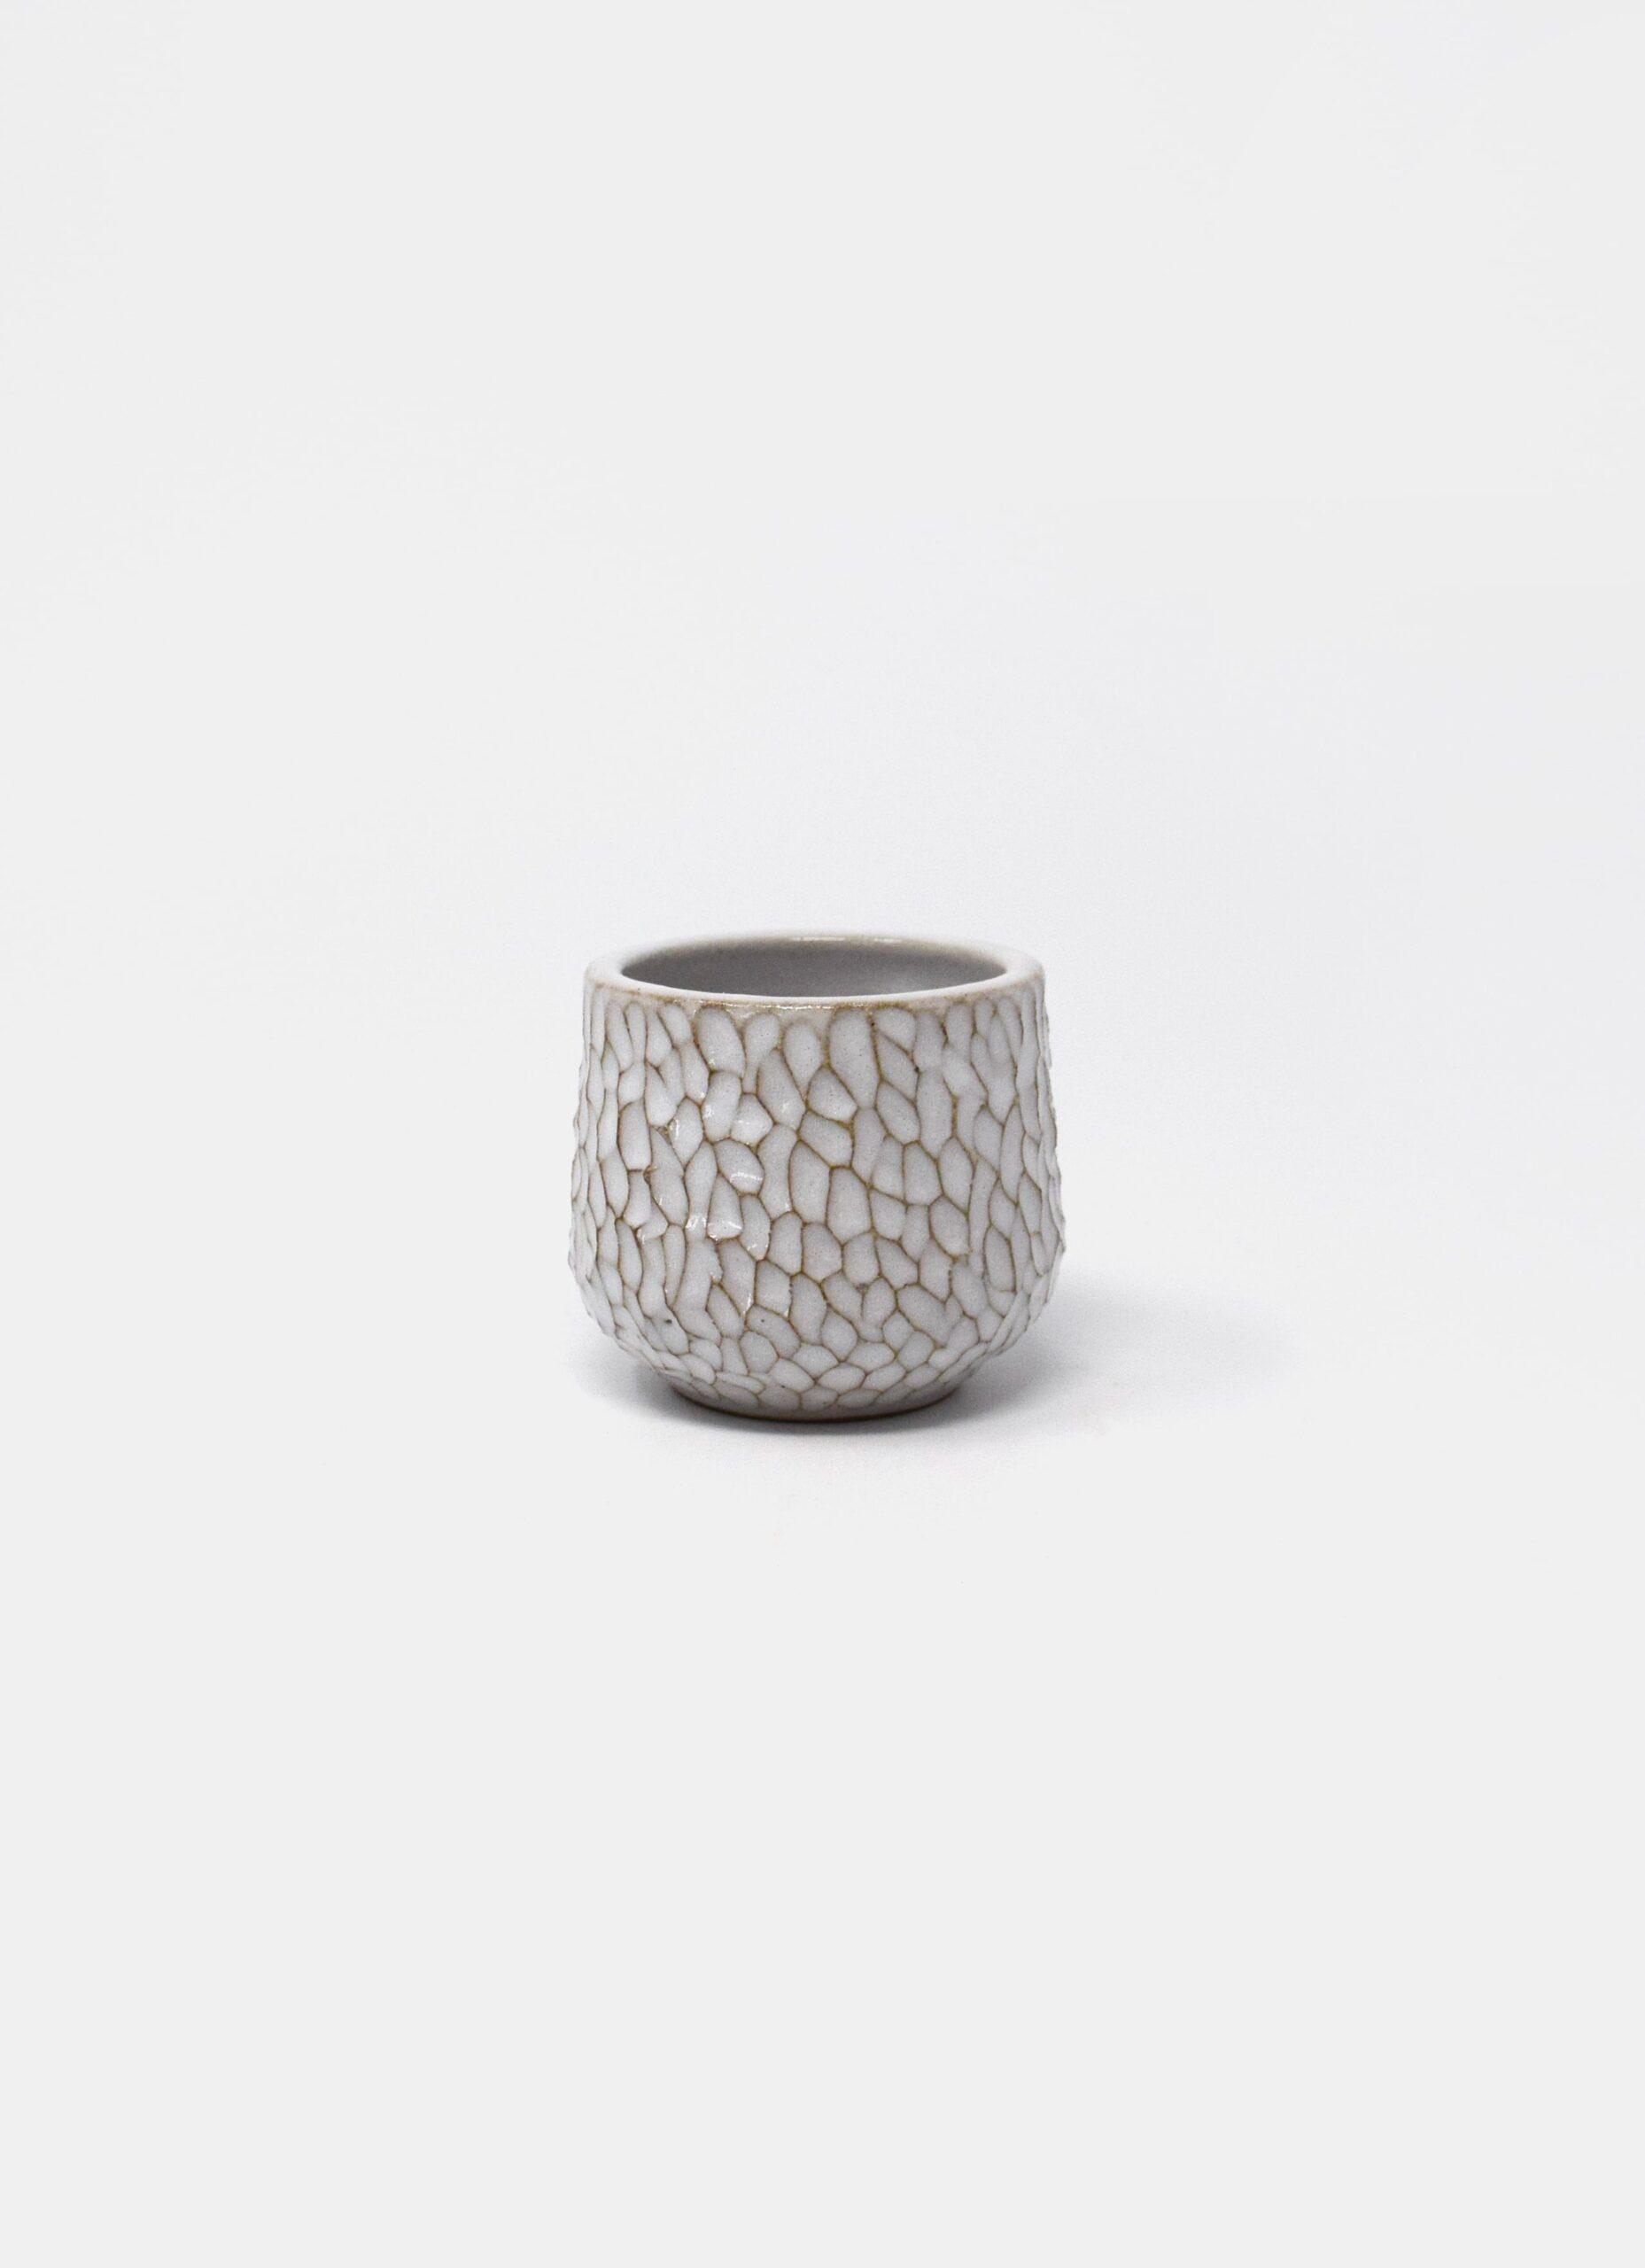 Aurore Vienne - Carved Ceramic - Cup